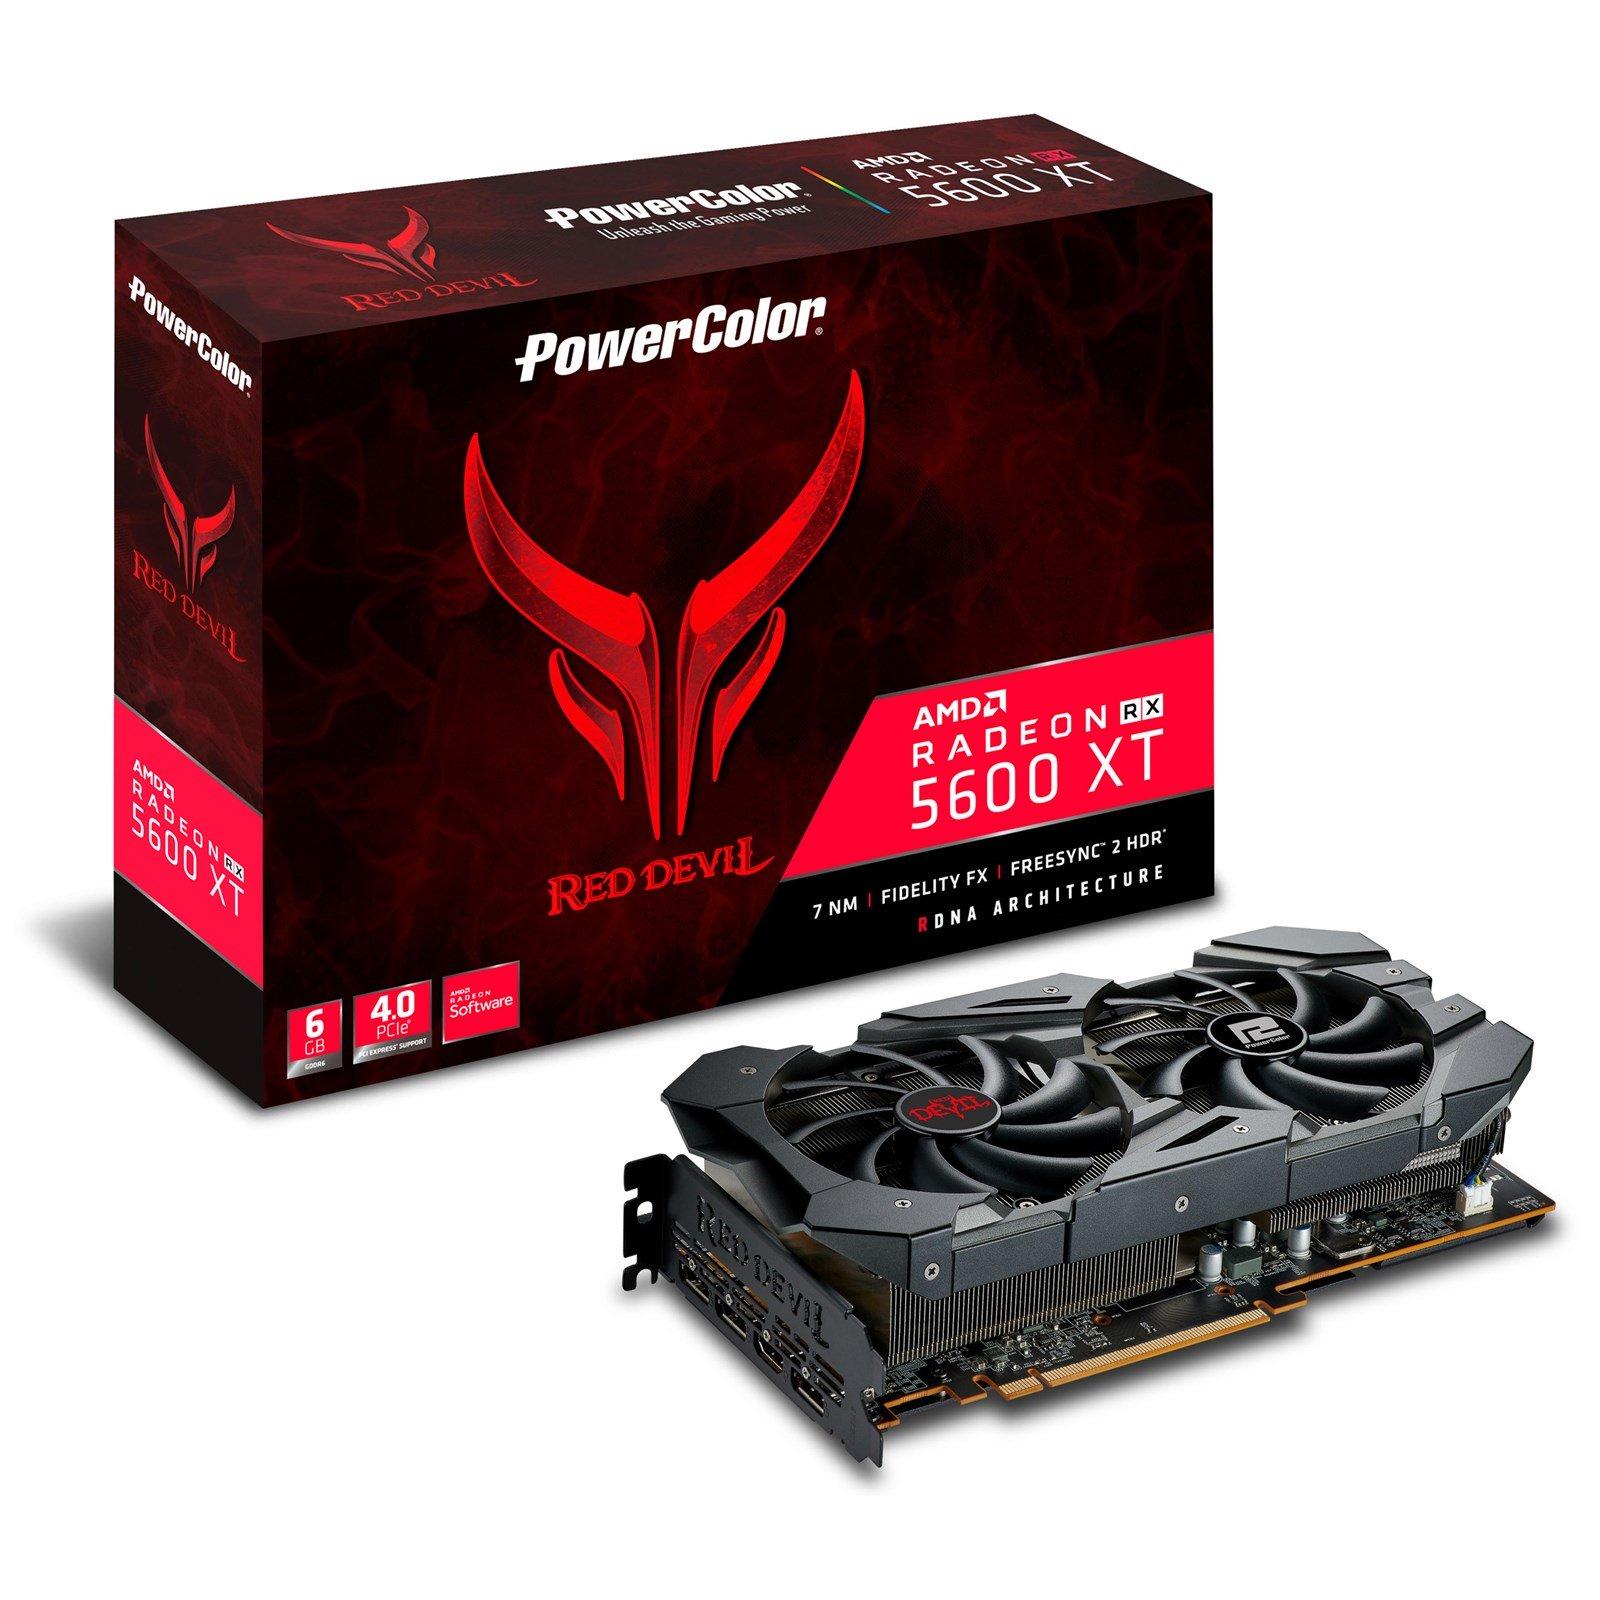 PowerColor Radeon RX 5600 XT Red Devil 6GB + free game bundle - £316.14 delivered @ CCLOnline